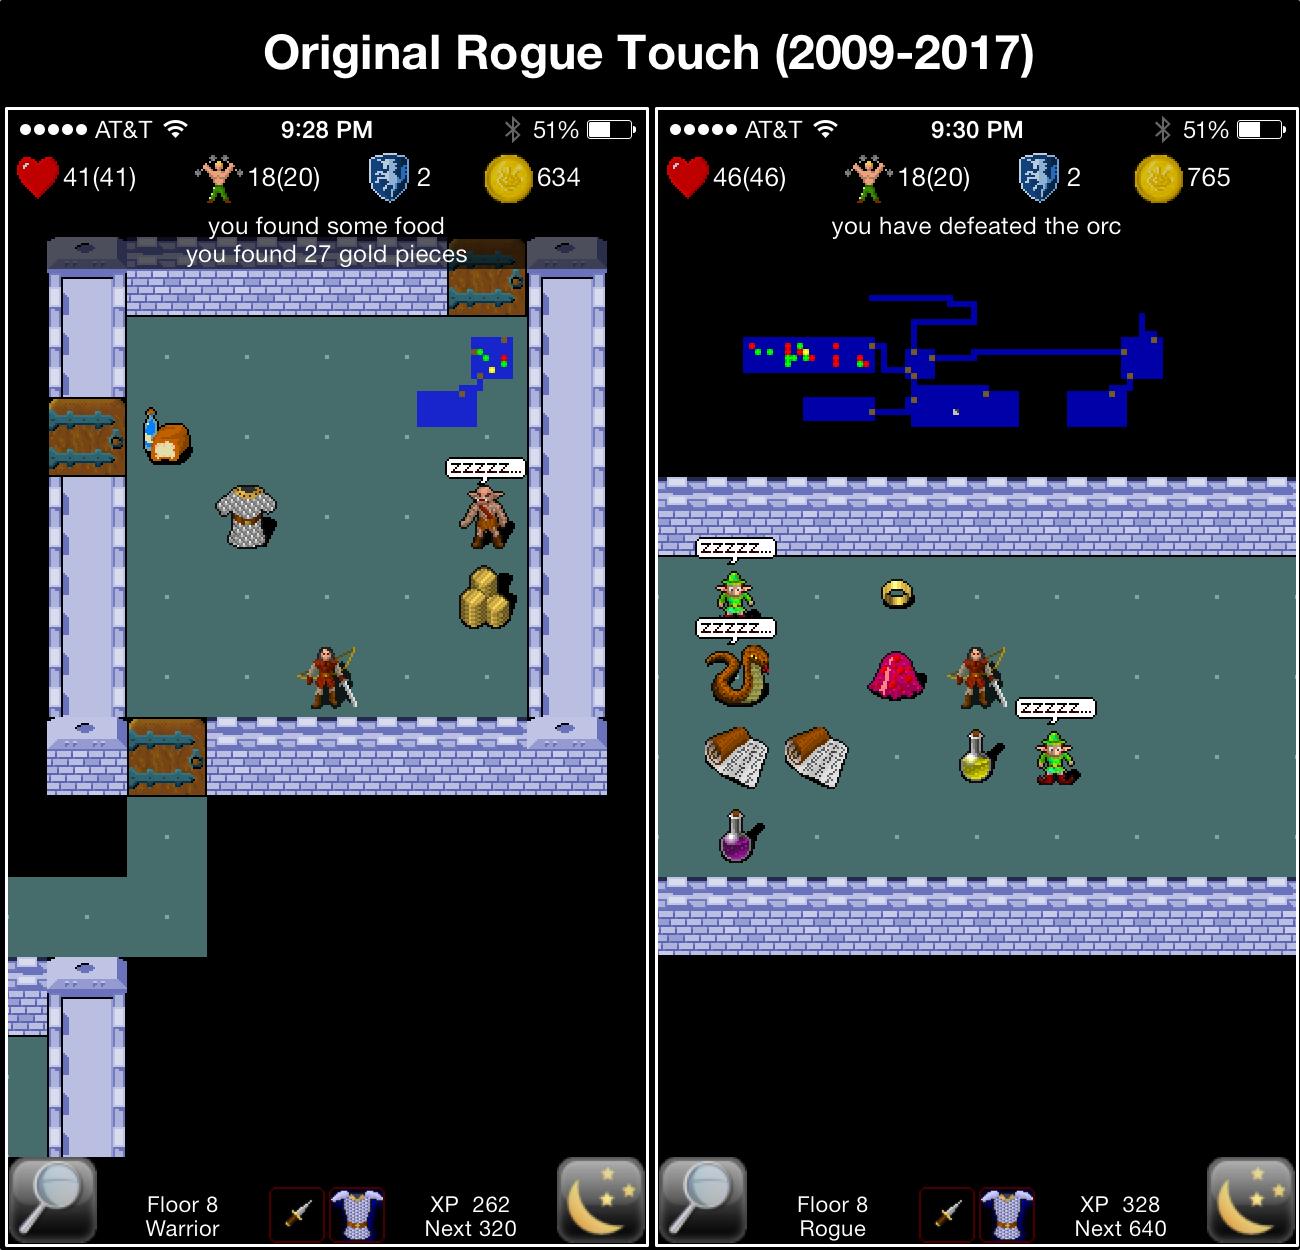 Original Rogue Touch (2009-2017)